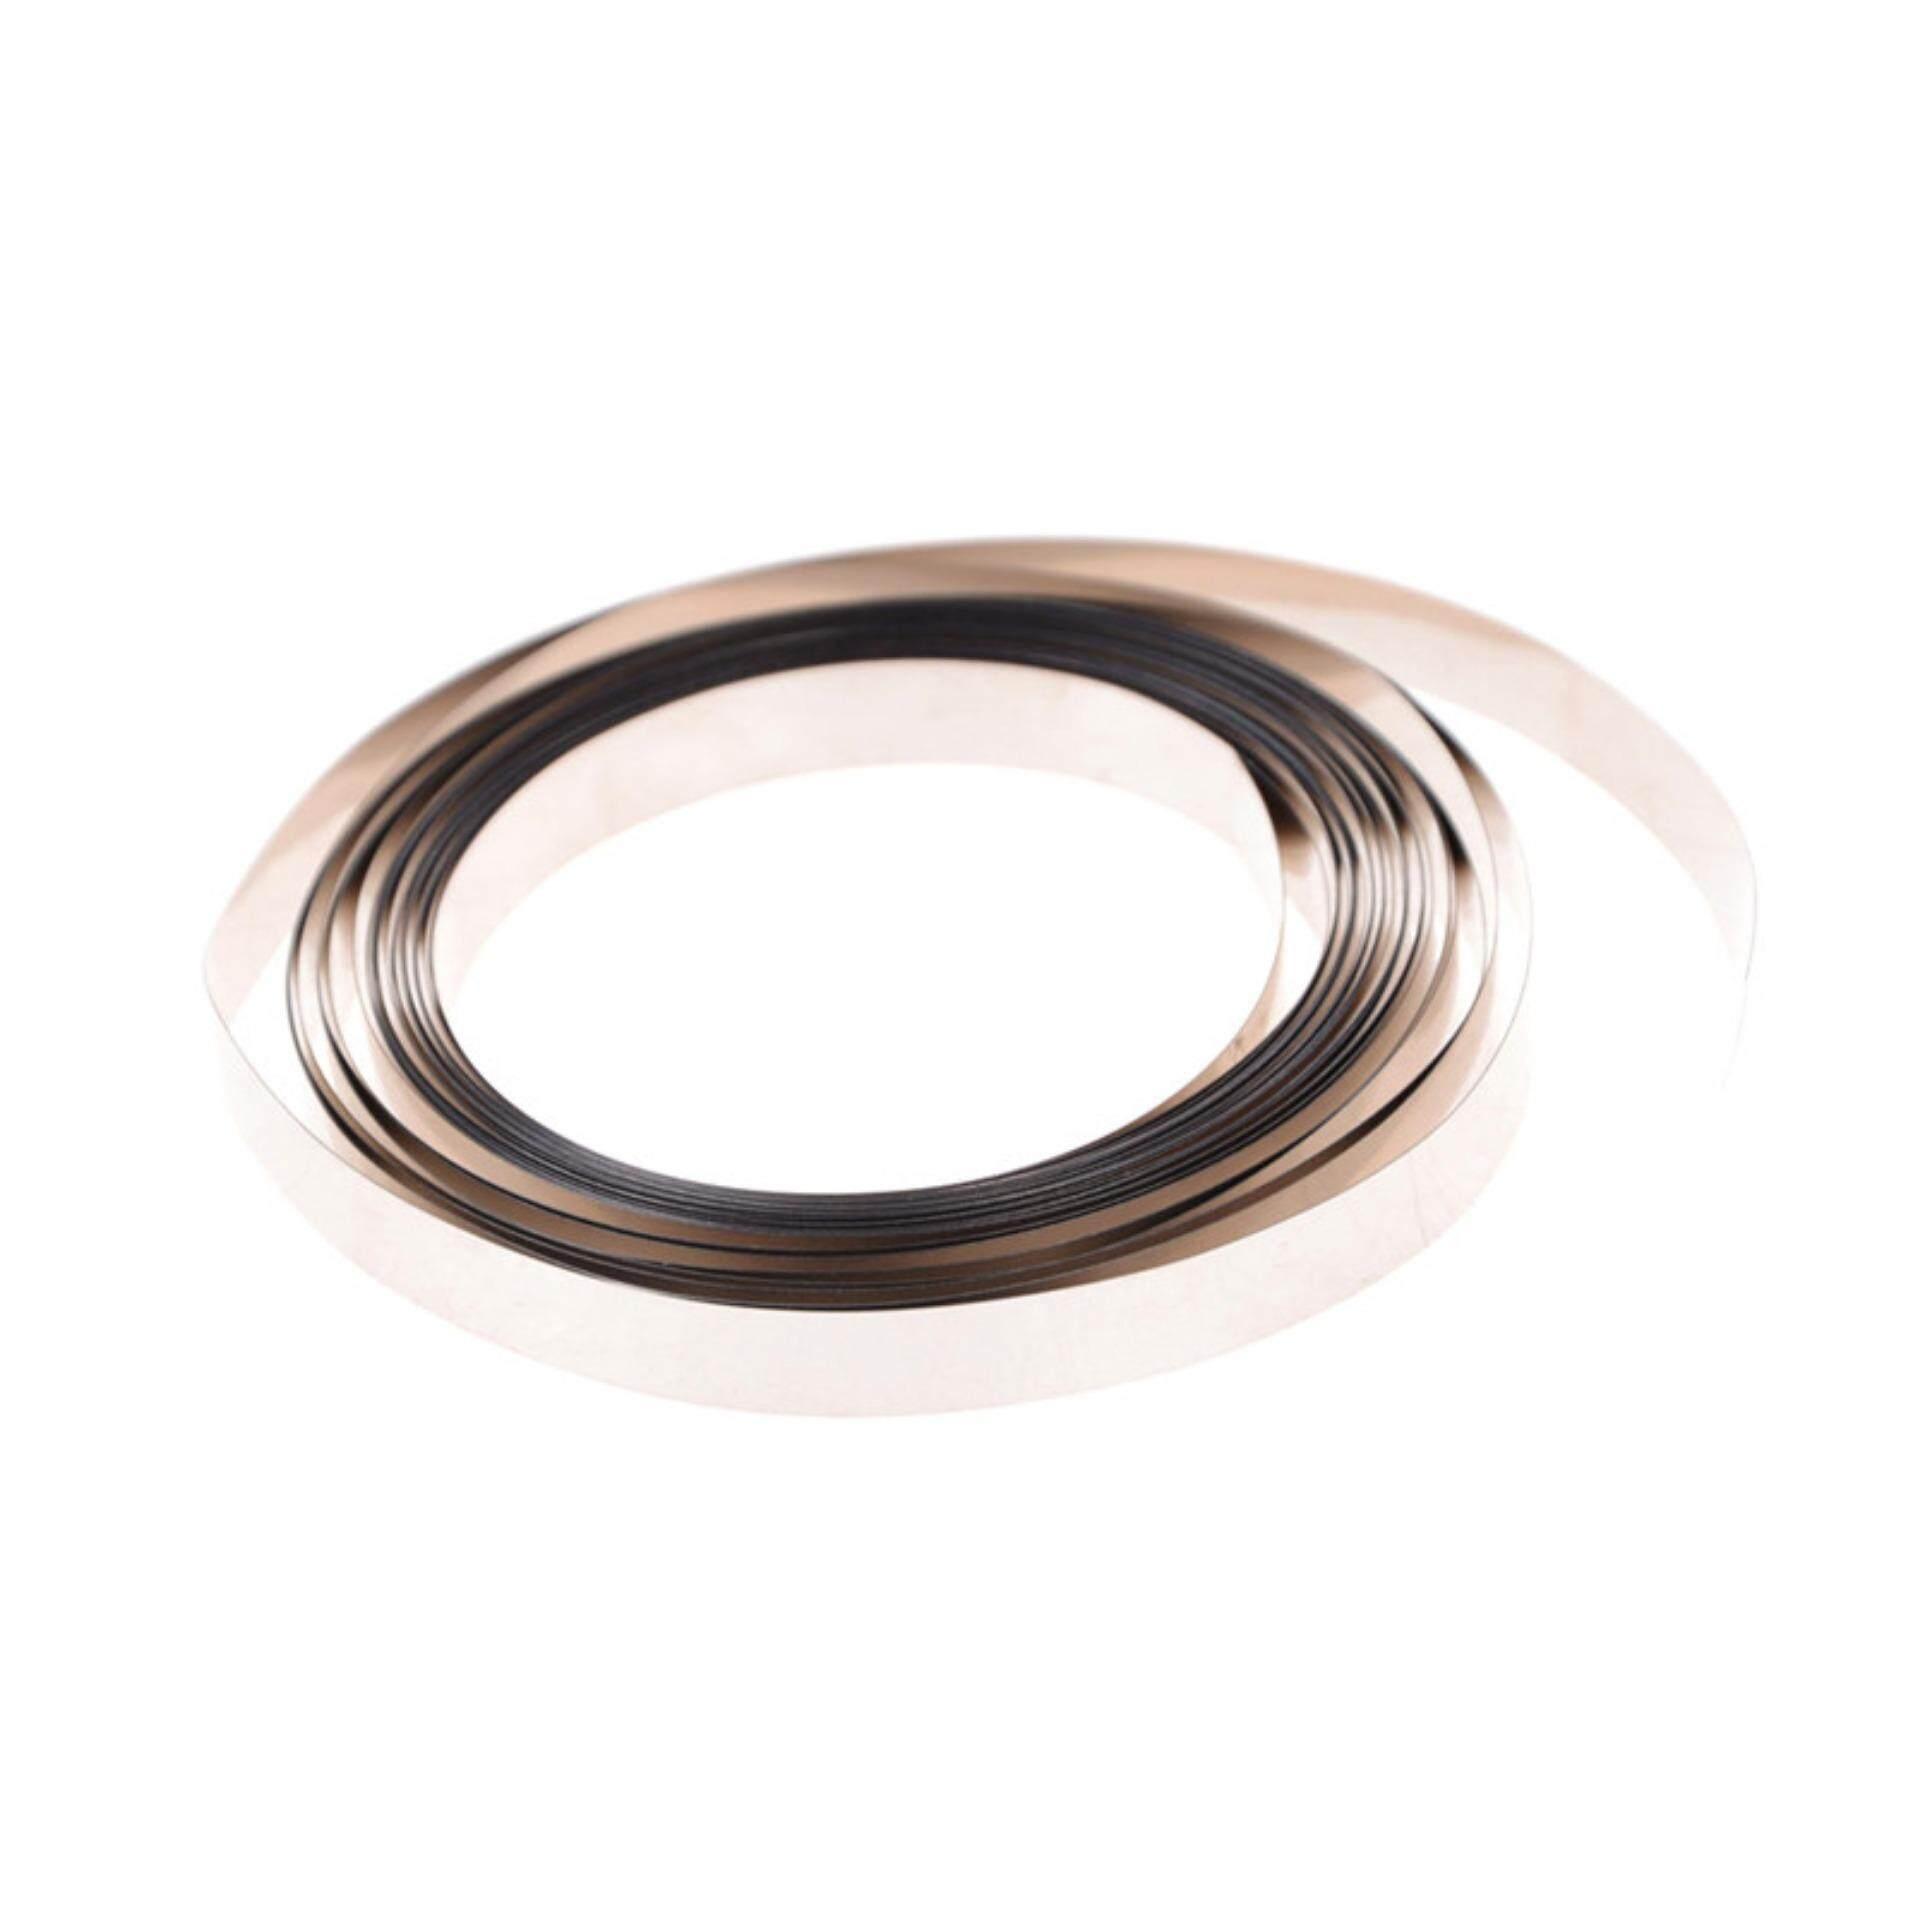 5m Pure Ni Plate Nickel Strip Tape For Li 18650 Battery Spot Welding 8mm x 0.1